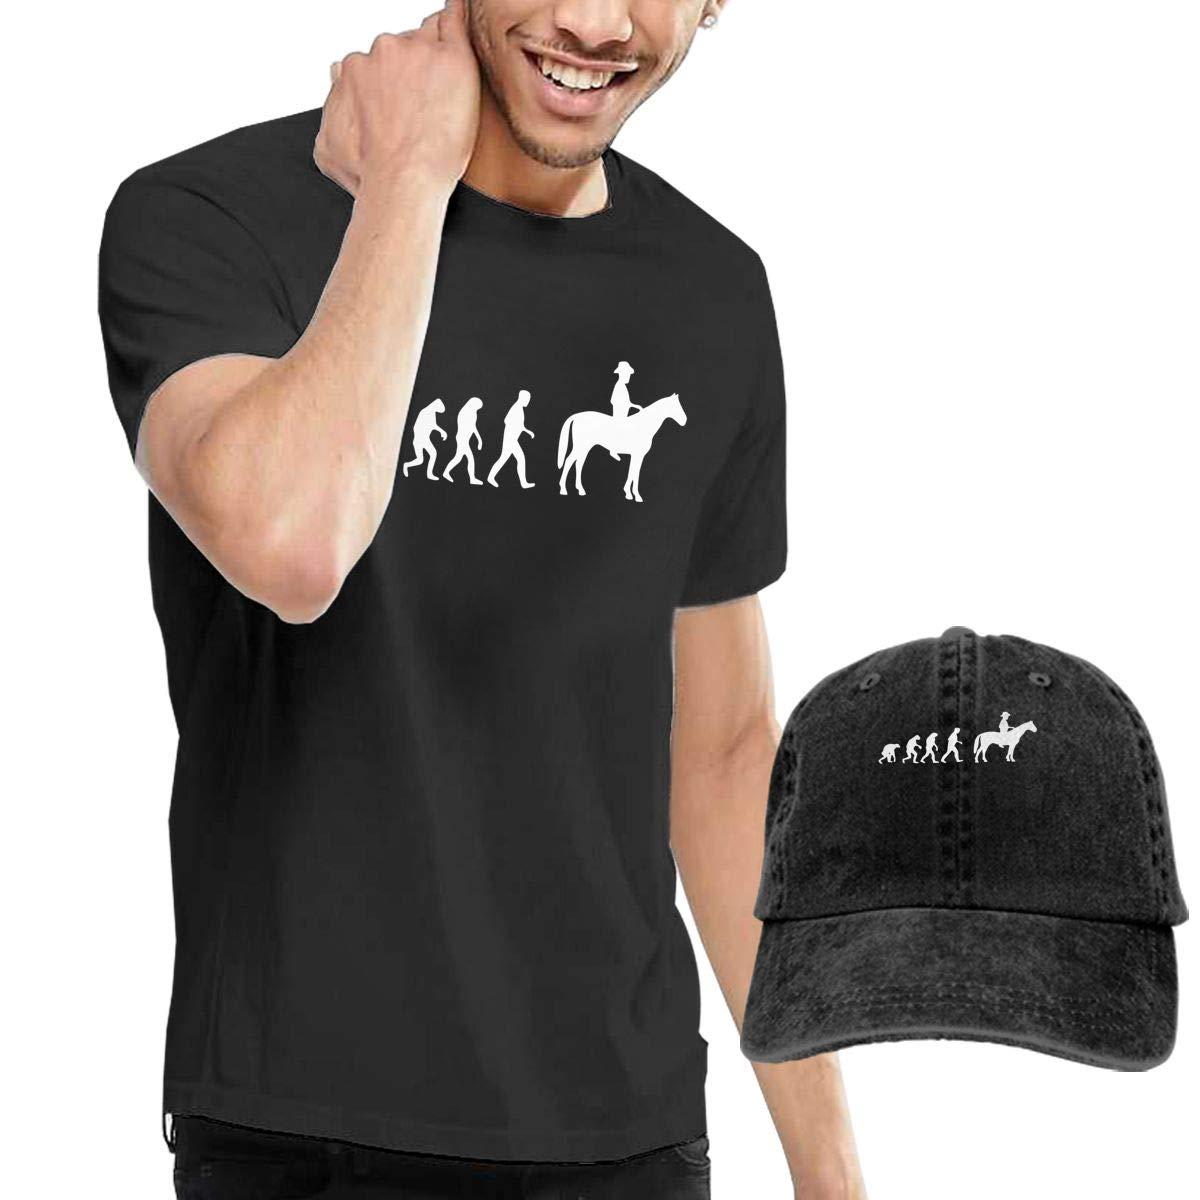 QqZXD Evolution Cowboy Fashion Mens T-Shirt Hats Youth /& Adult T-Shirts